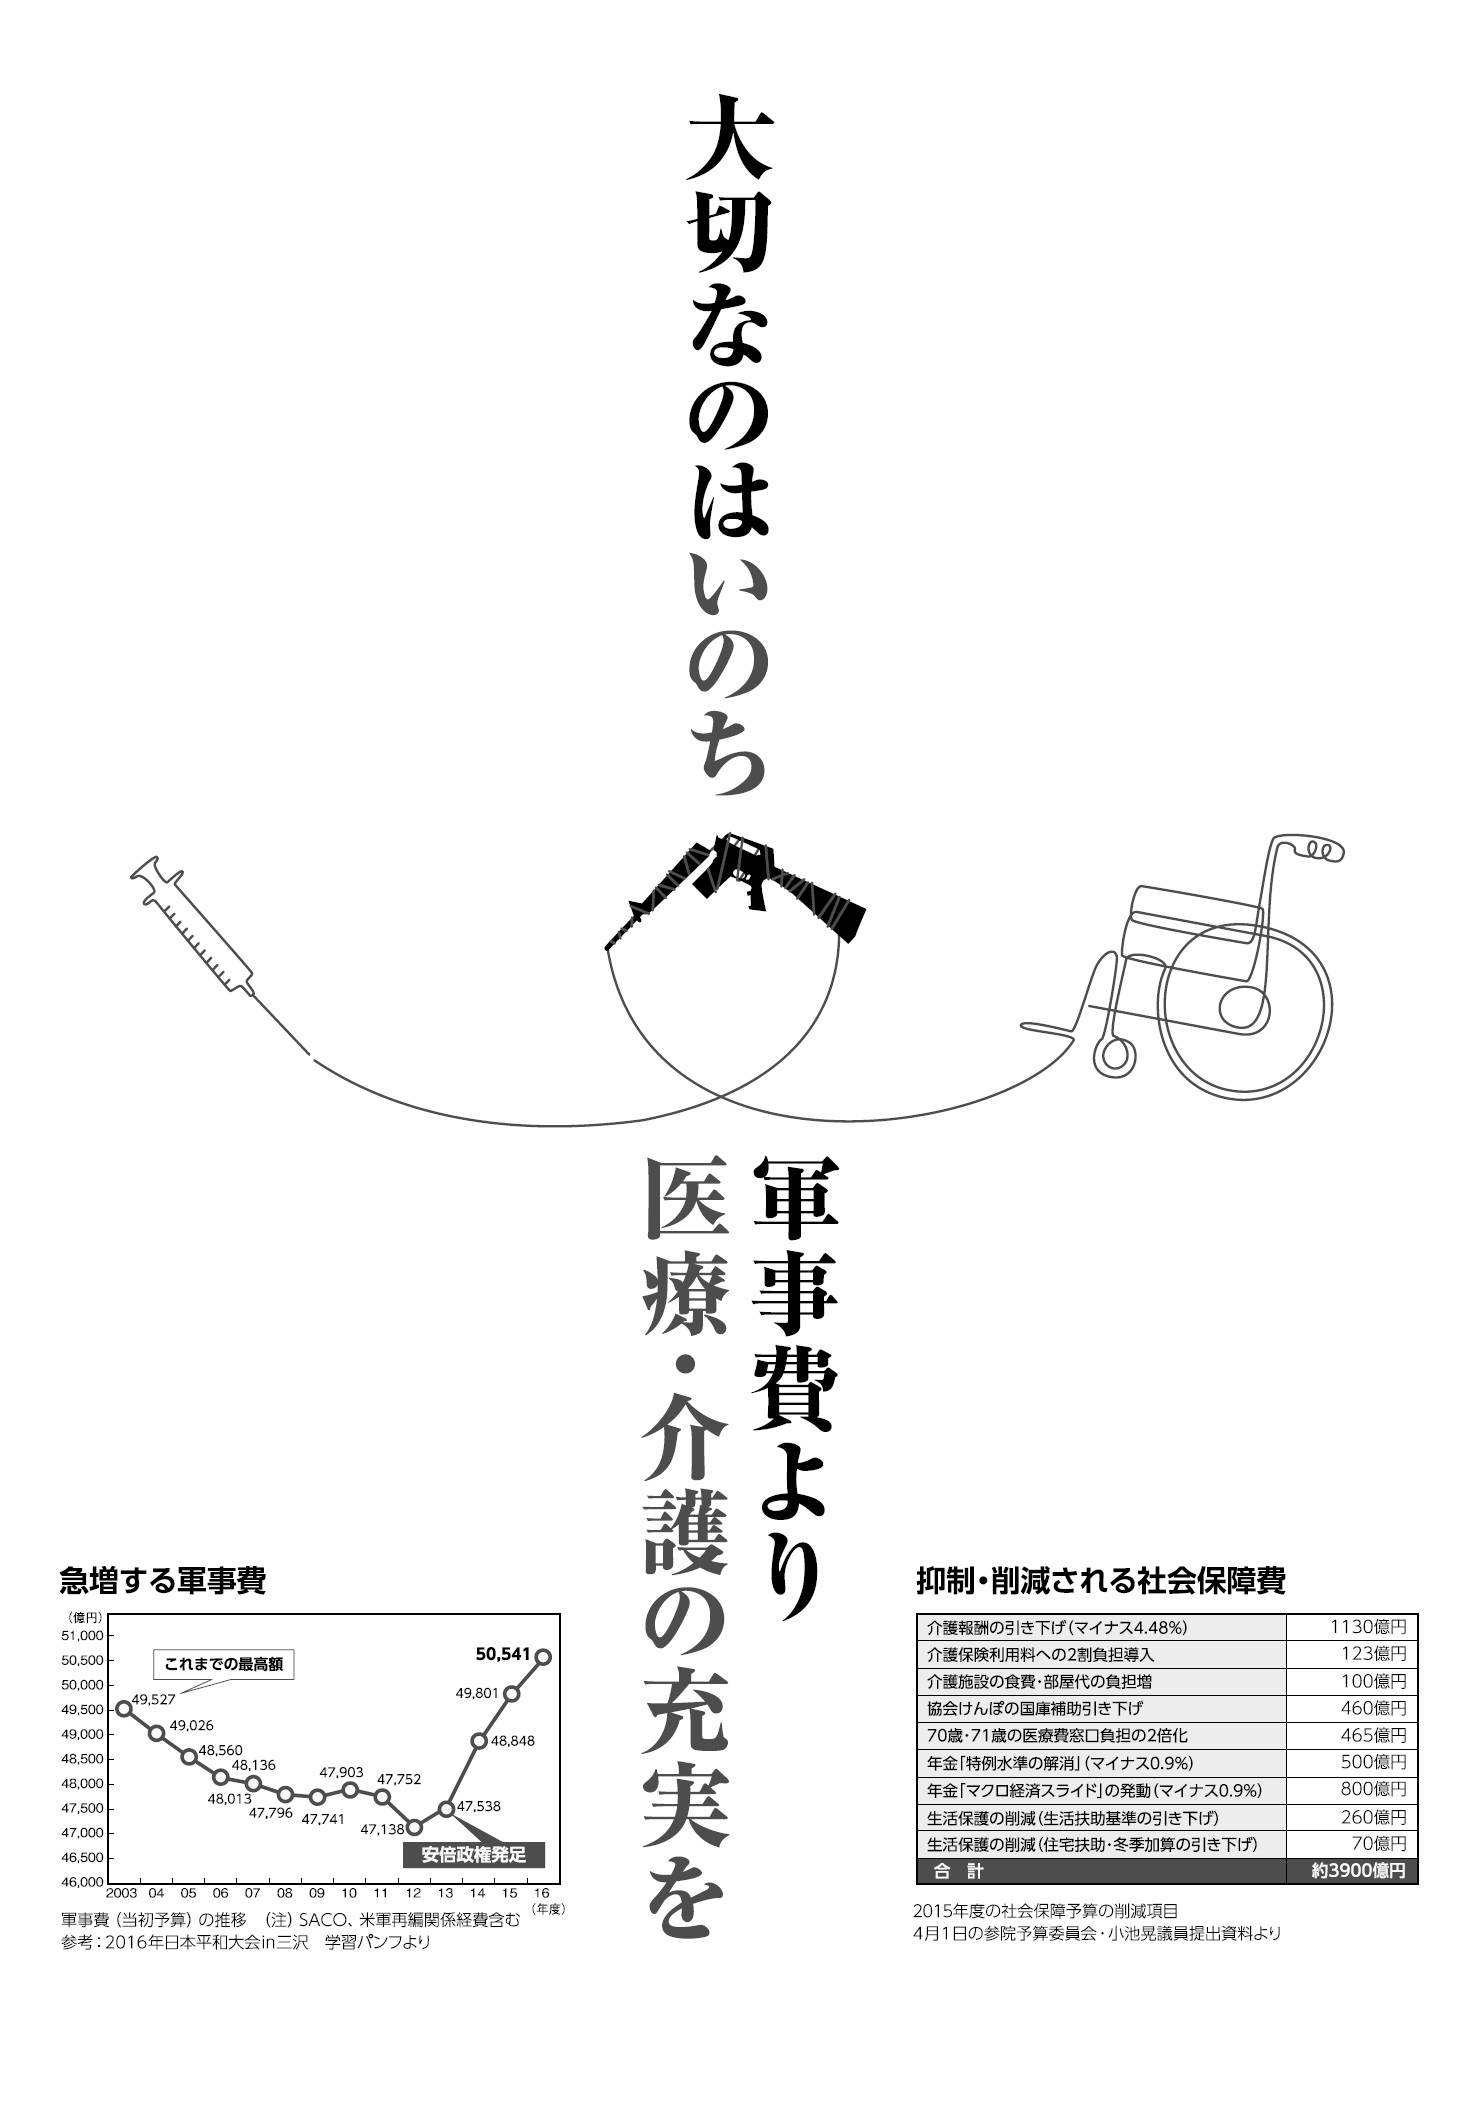 http://irouren.or.jp/news/%E6%86%B2%E6%B3%95%E7%BD%B2%E5%90%8D%E2%91%A0.jpg